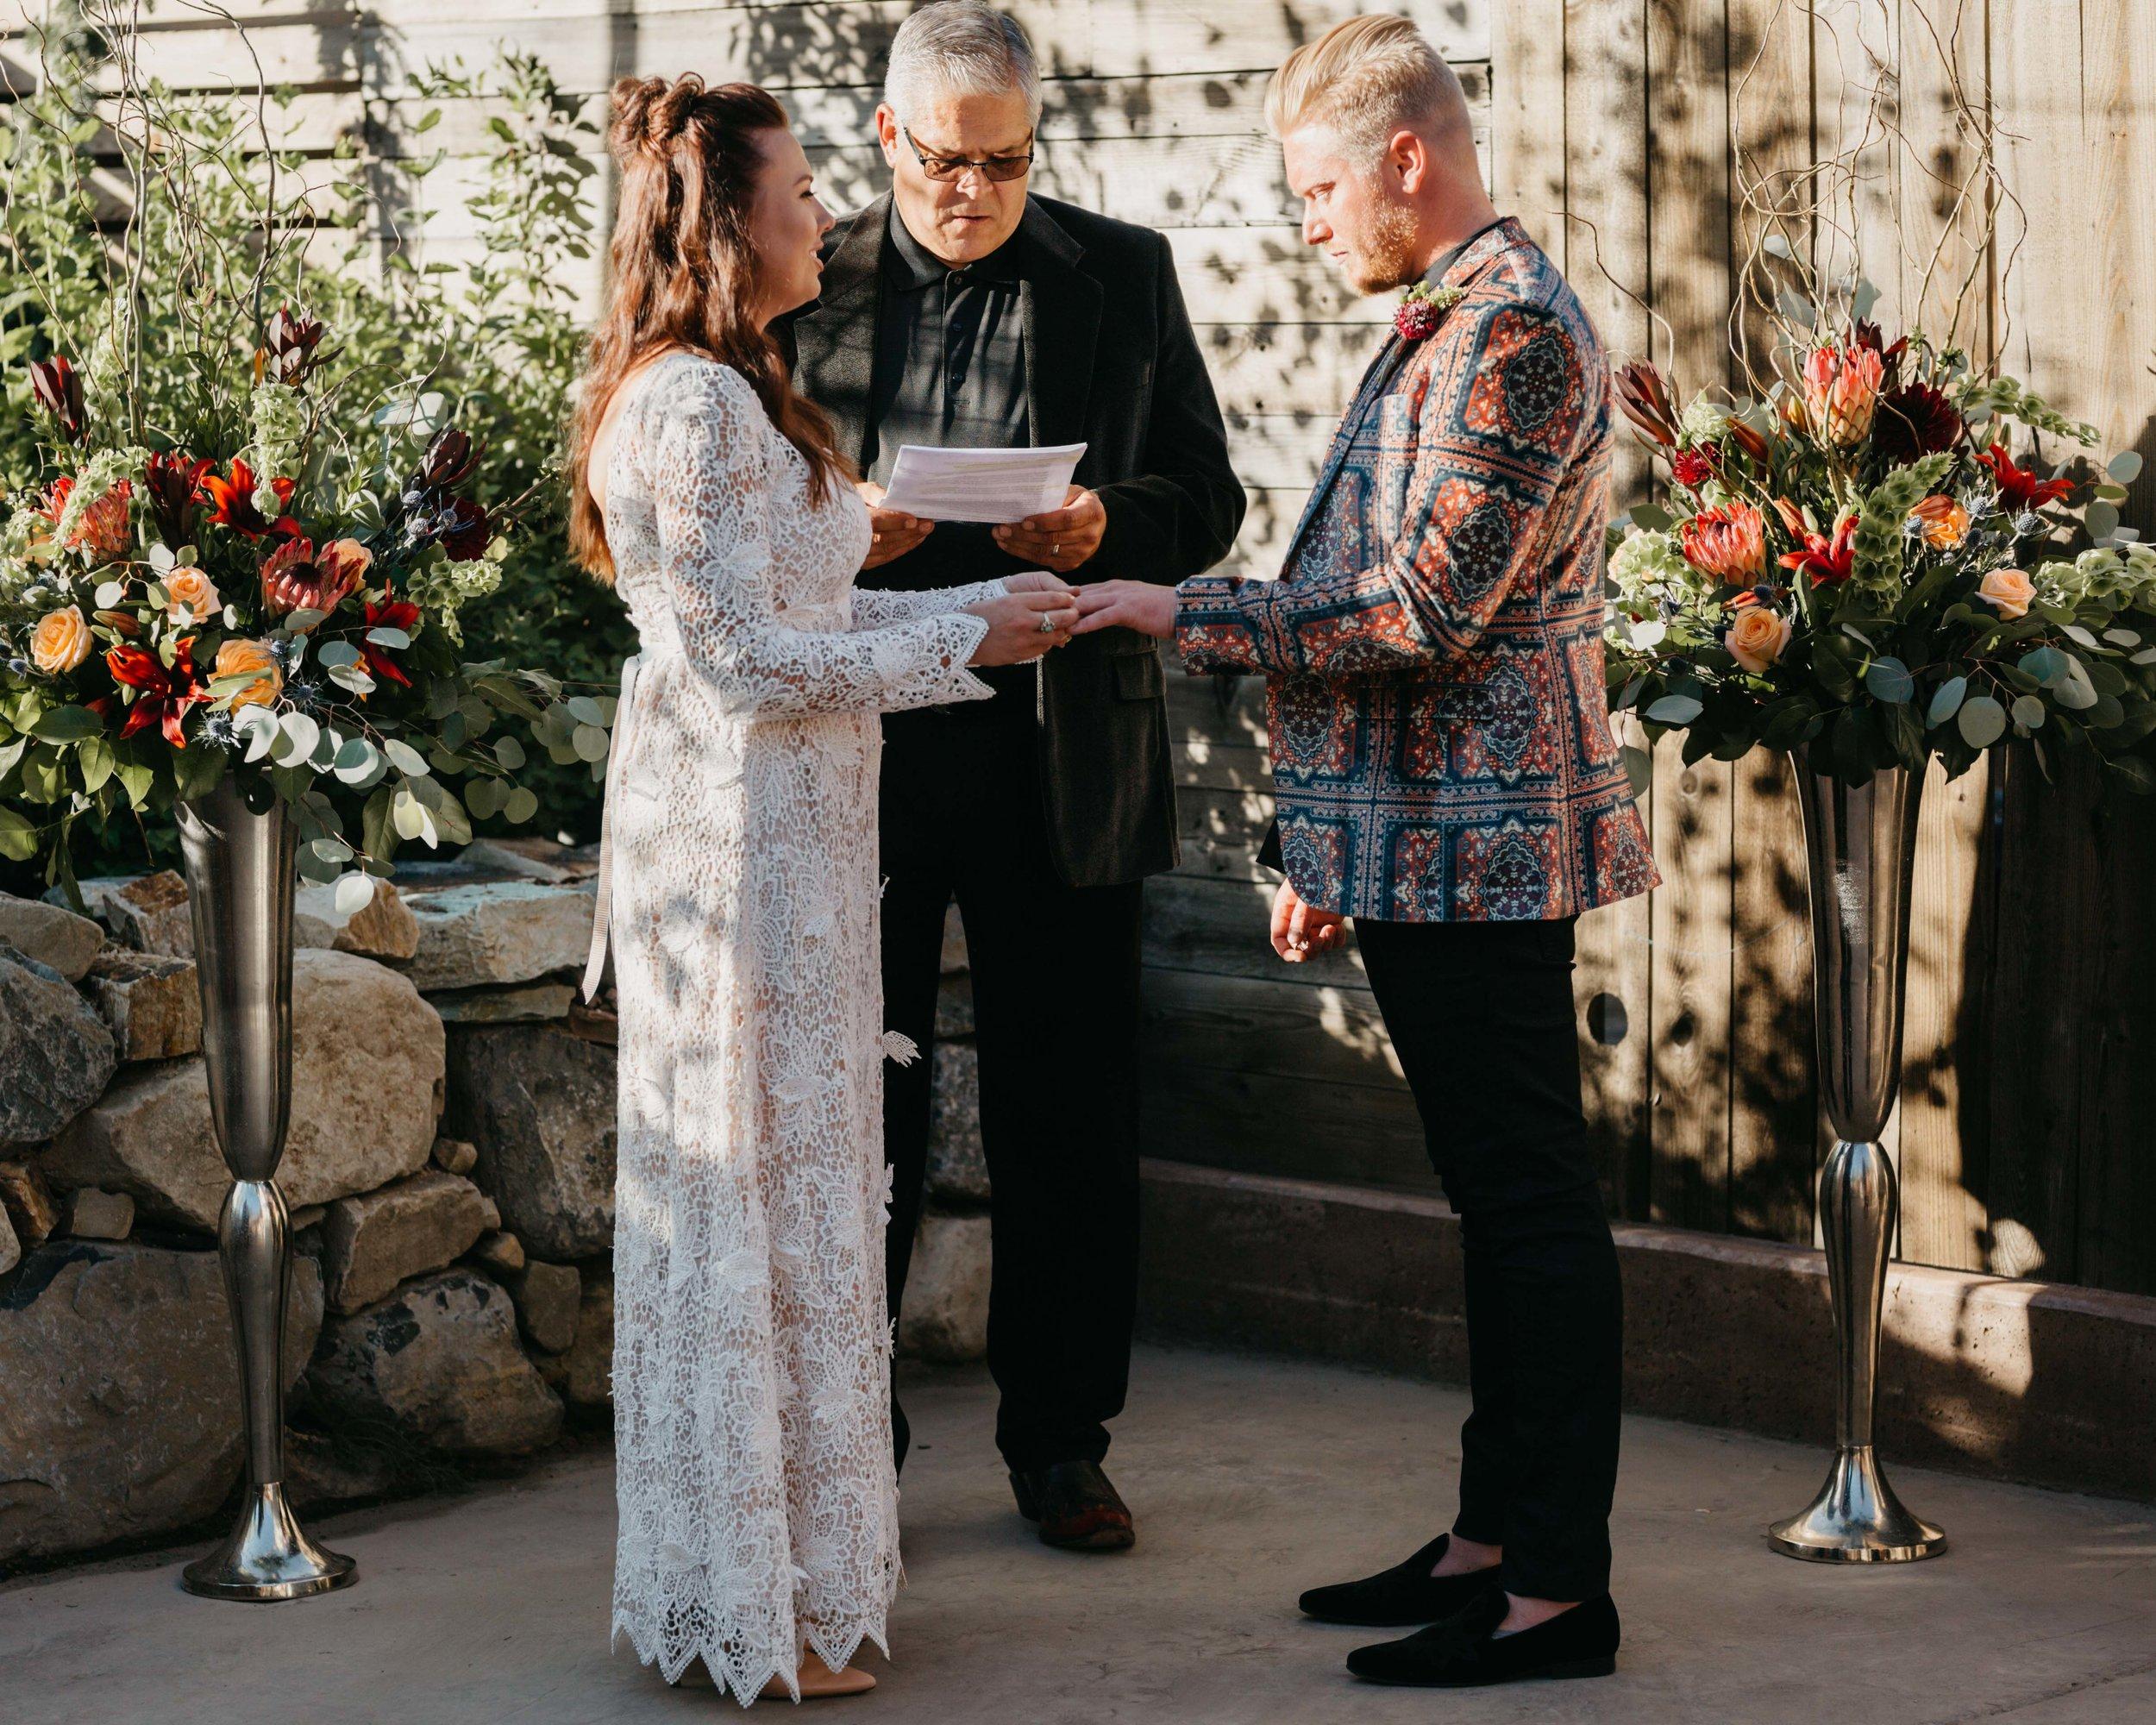 Utah-Wedding-Utah-Photographer-56.jpg